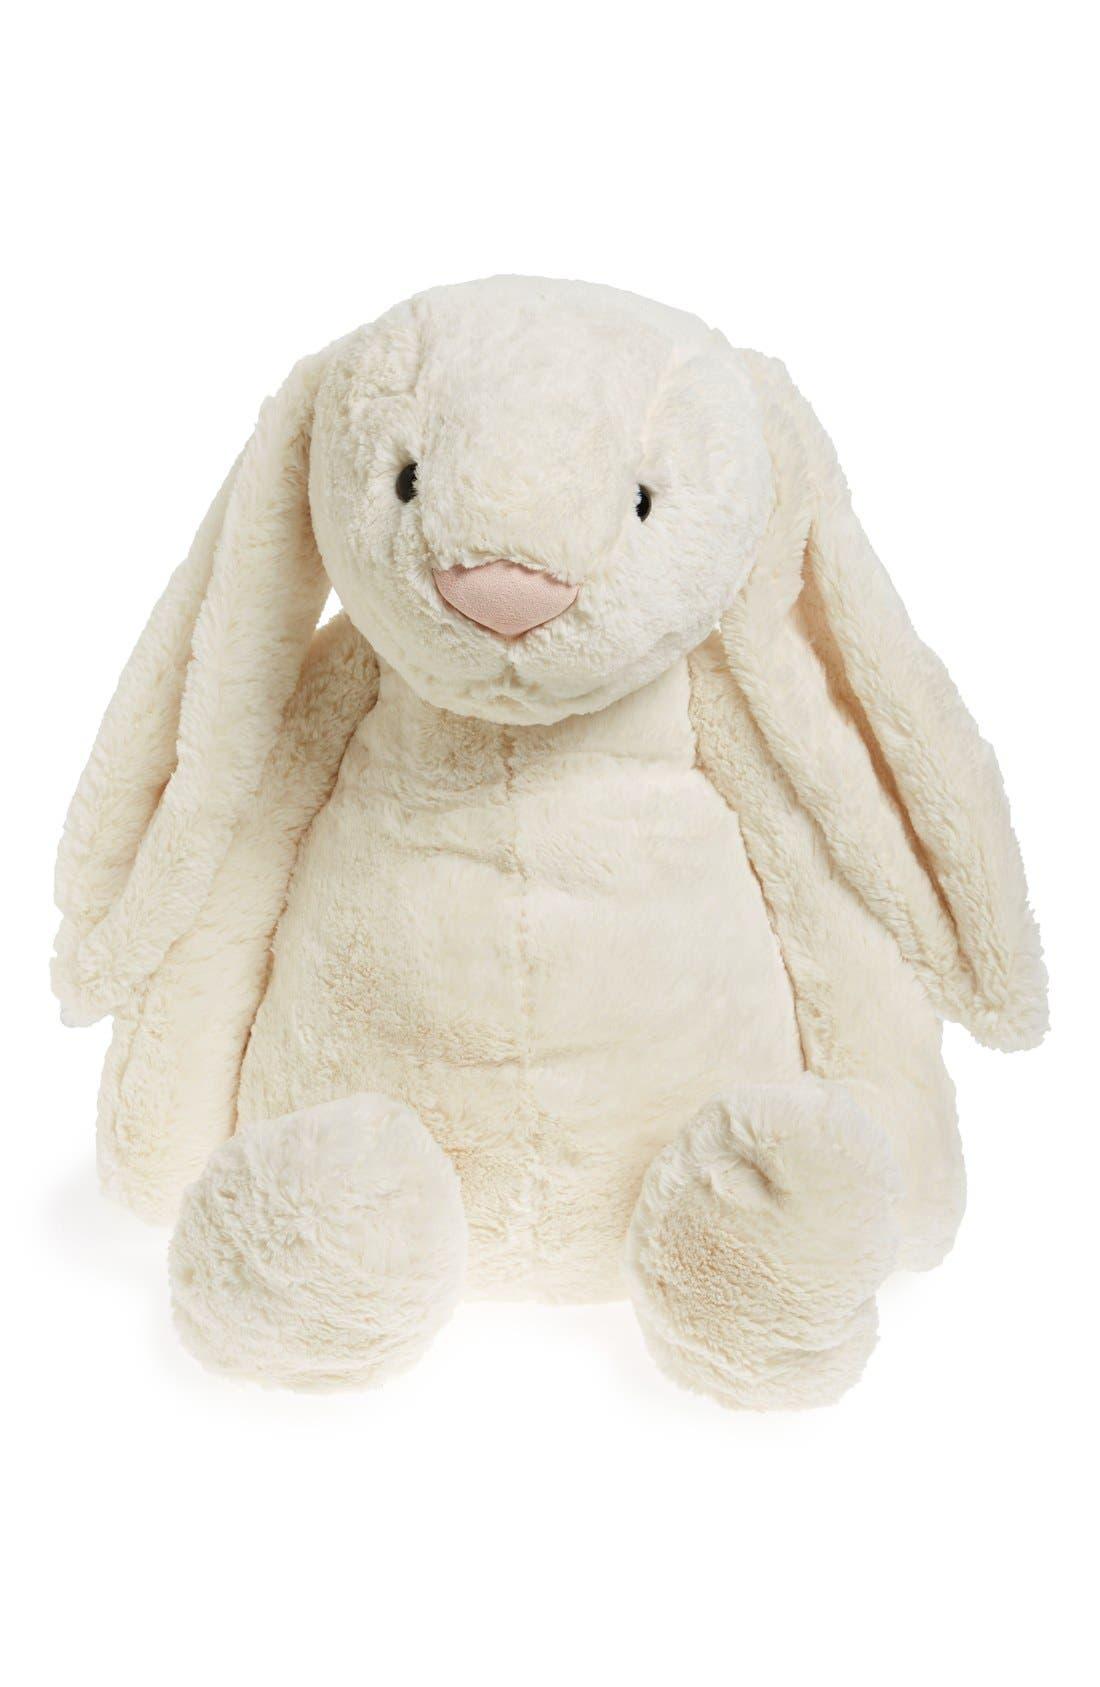 Alternate Image 1 Selected - Jellycat 'Really Big Bashful Bunny' Stuffed Animal